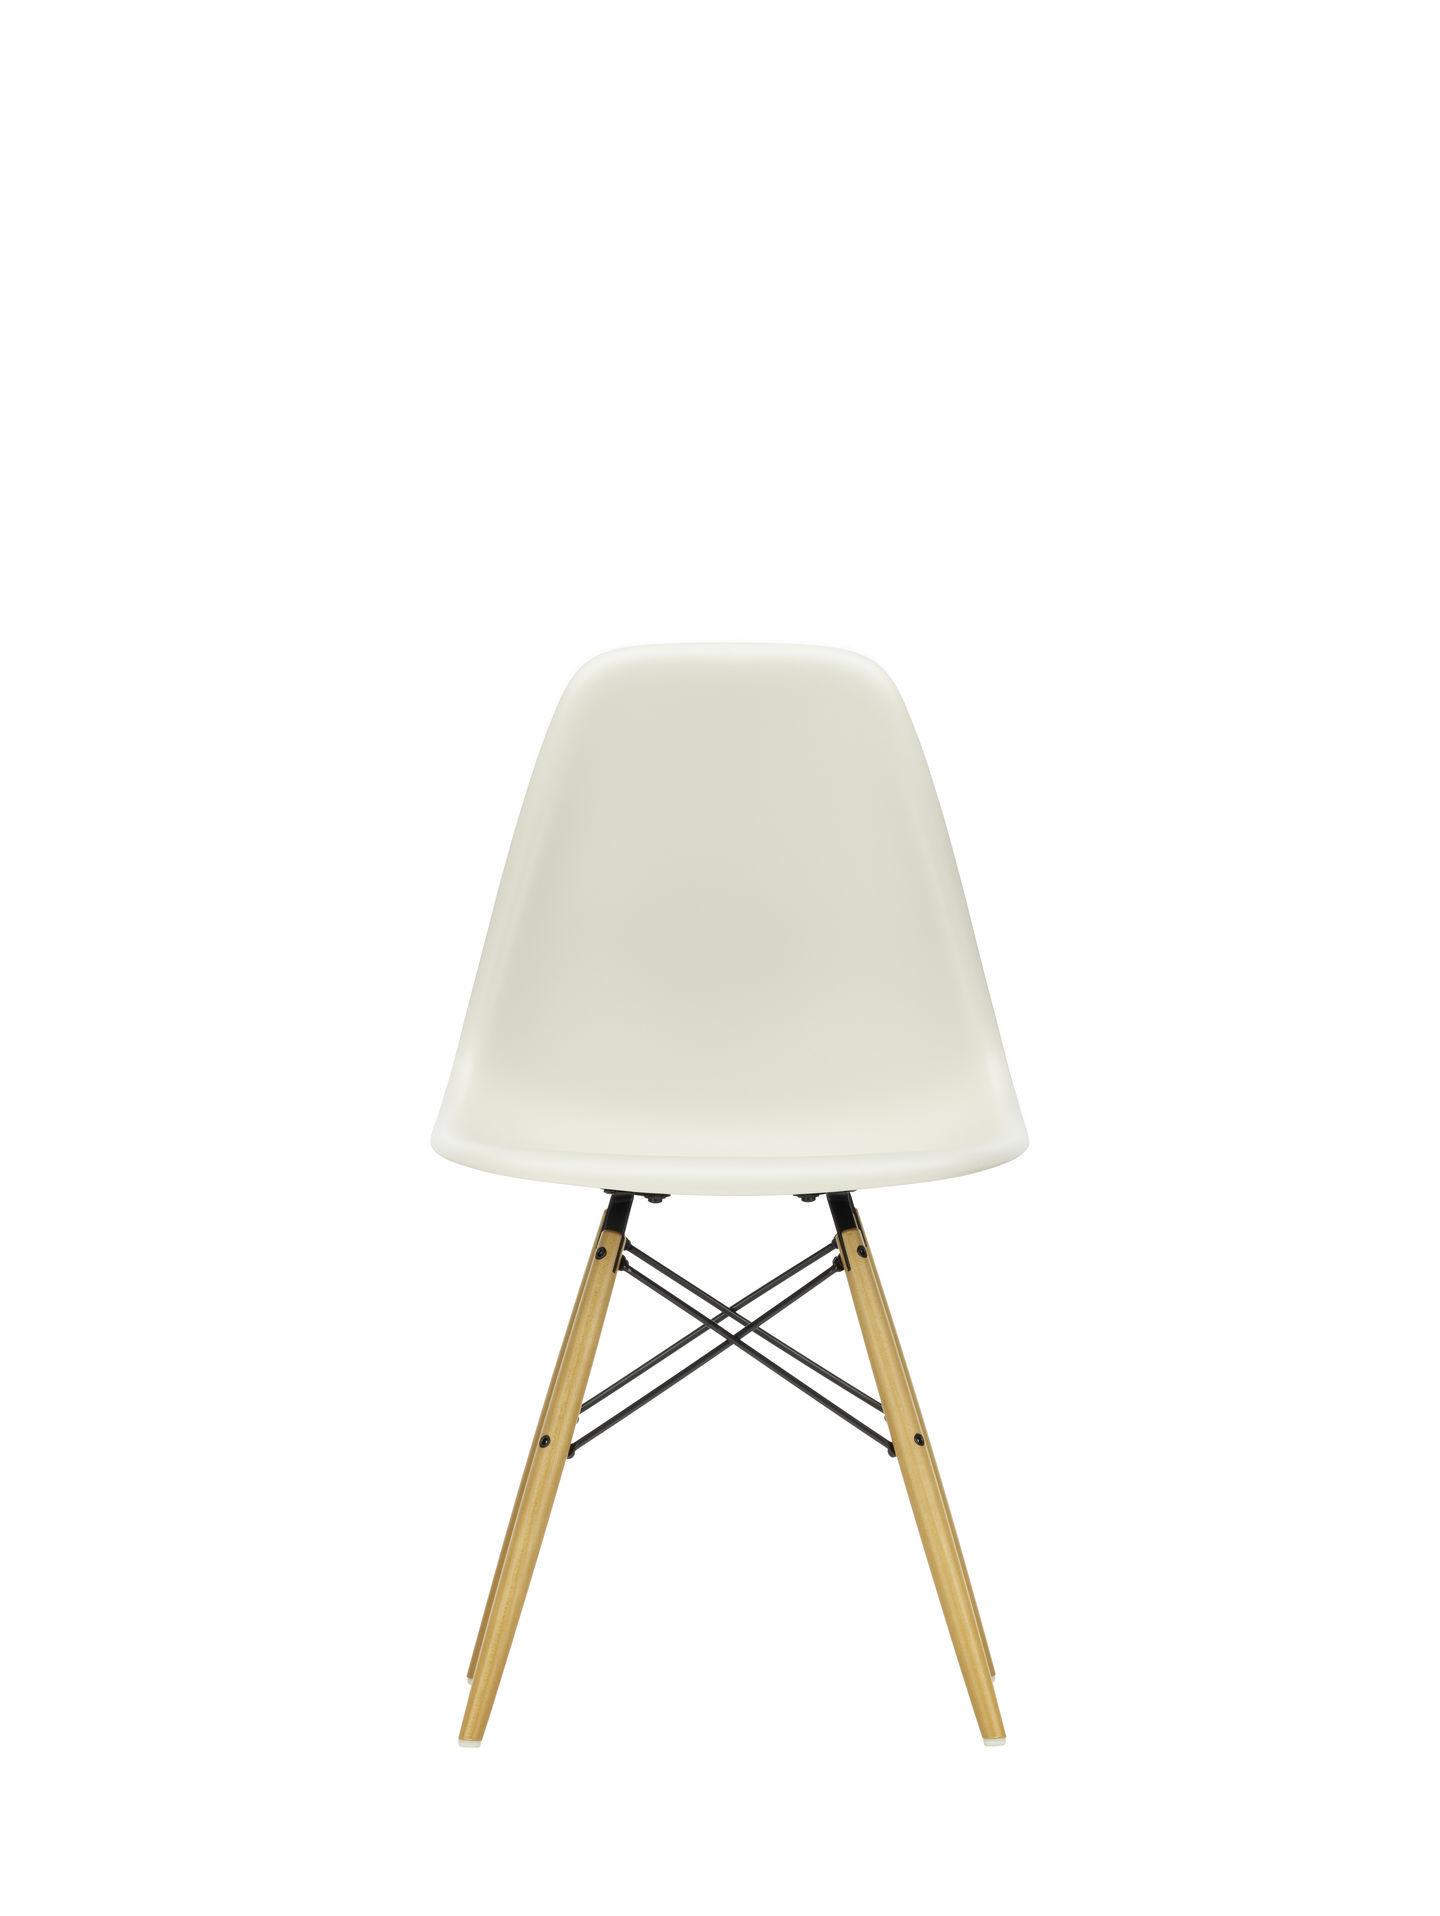 Eames Plastic Side Chair DSW Stuhl Vitra Ahorn dunkel-Grün